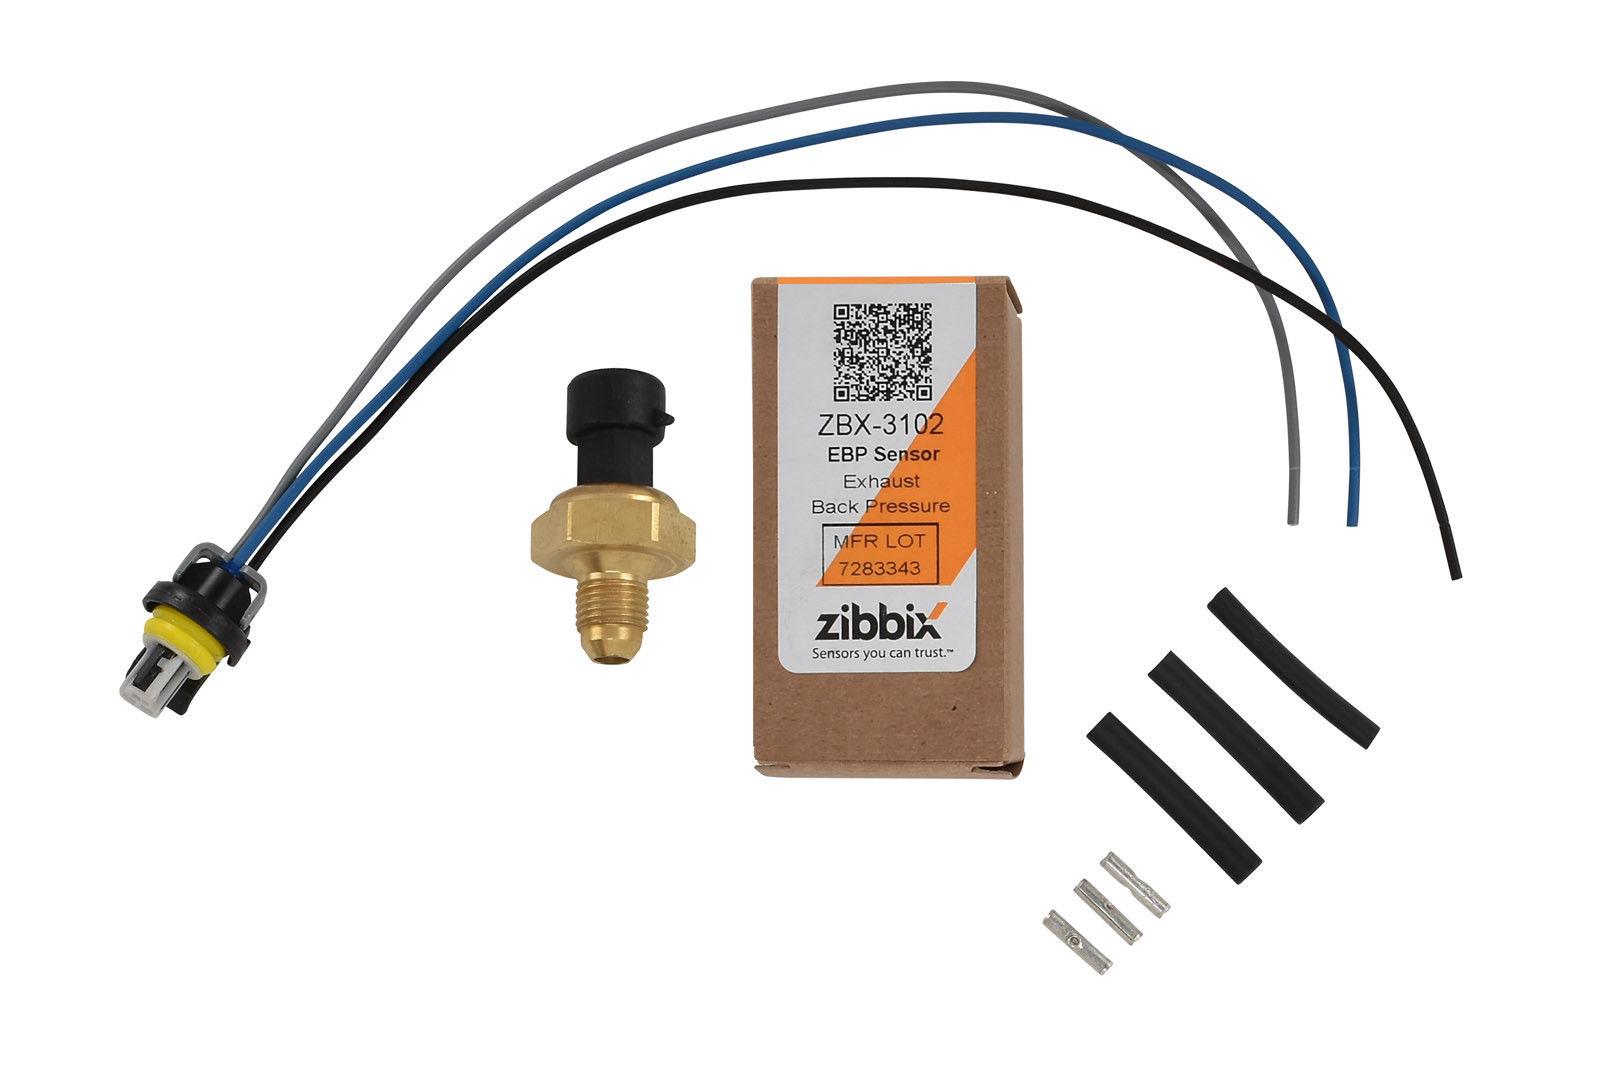 Zibbix ZBX-3102-PK5 EBP Exhaust Back Pressure Sensor Pigtail Kit For 05.5-10 6.0L Ford Powerstroke Diesel